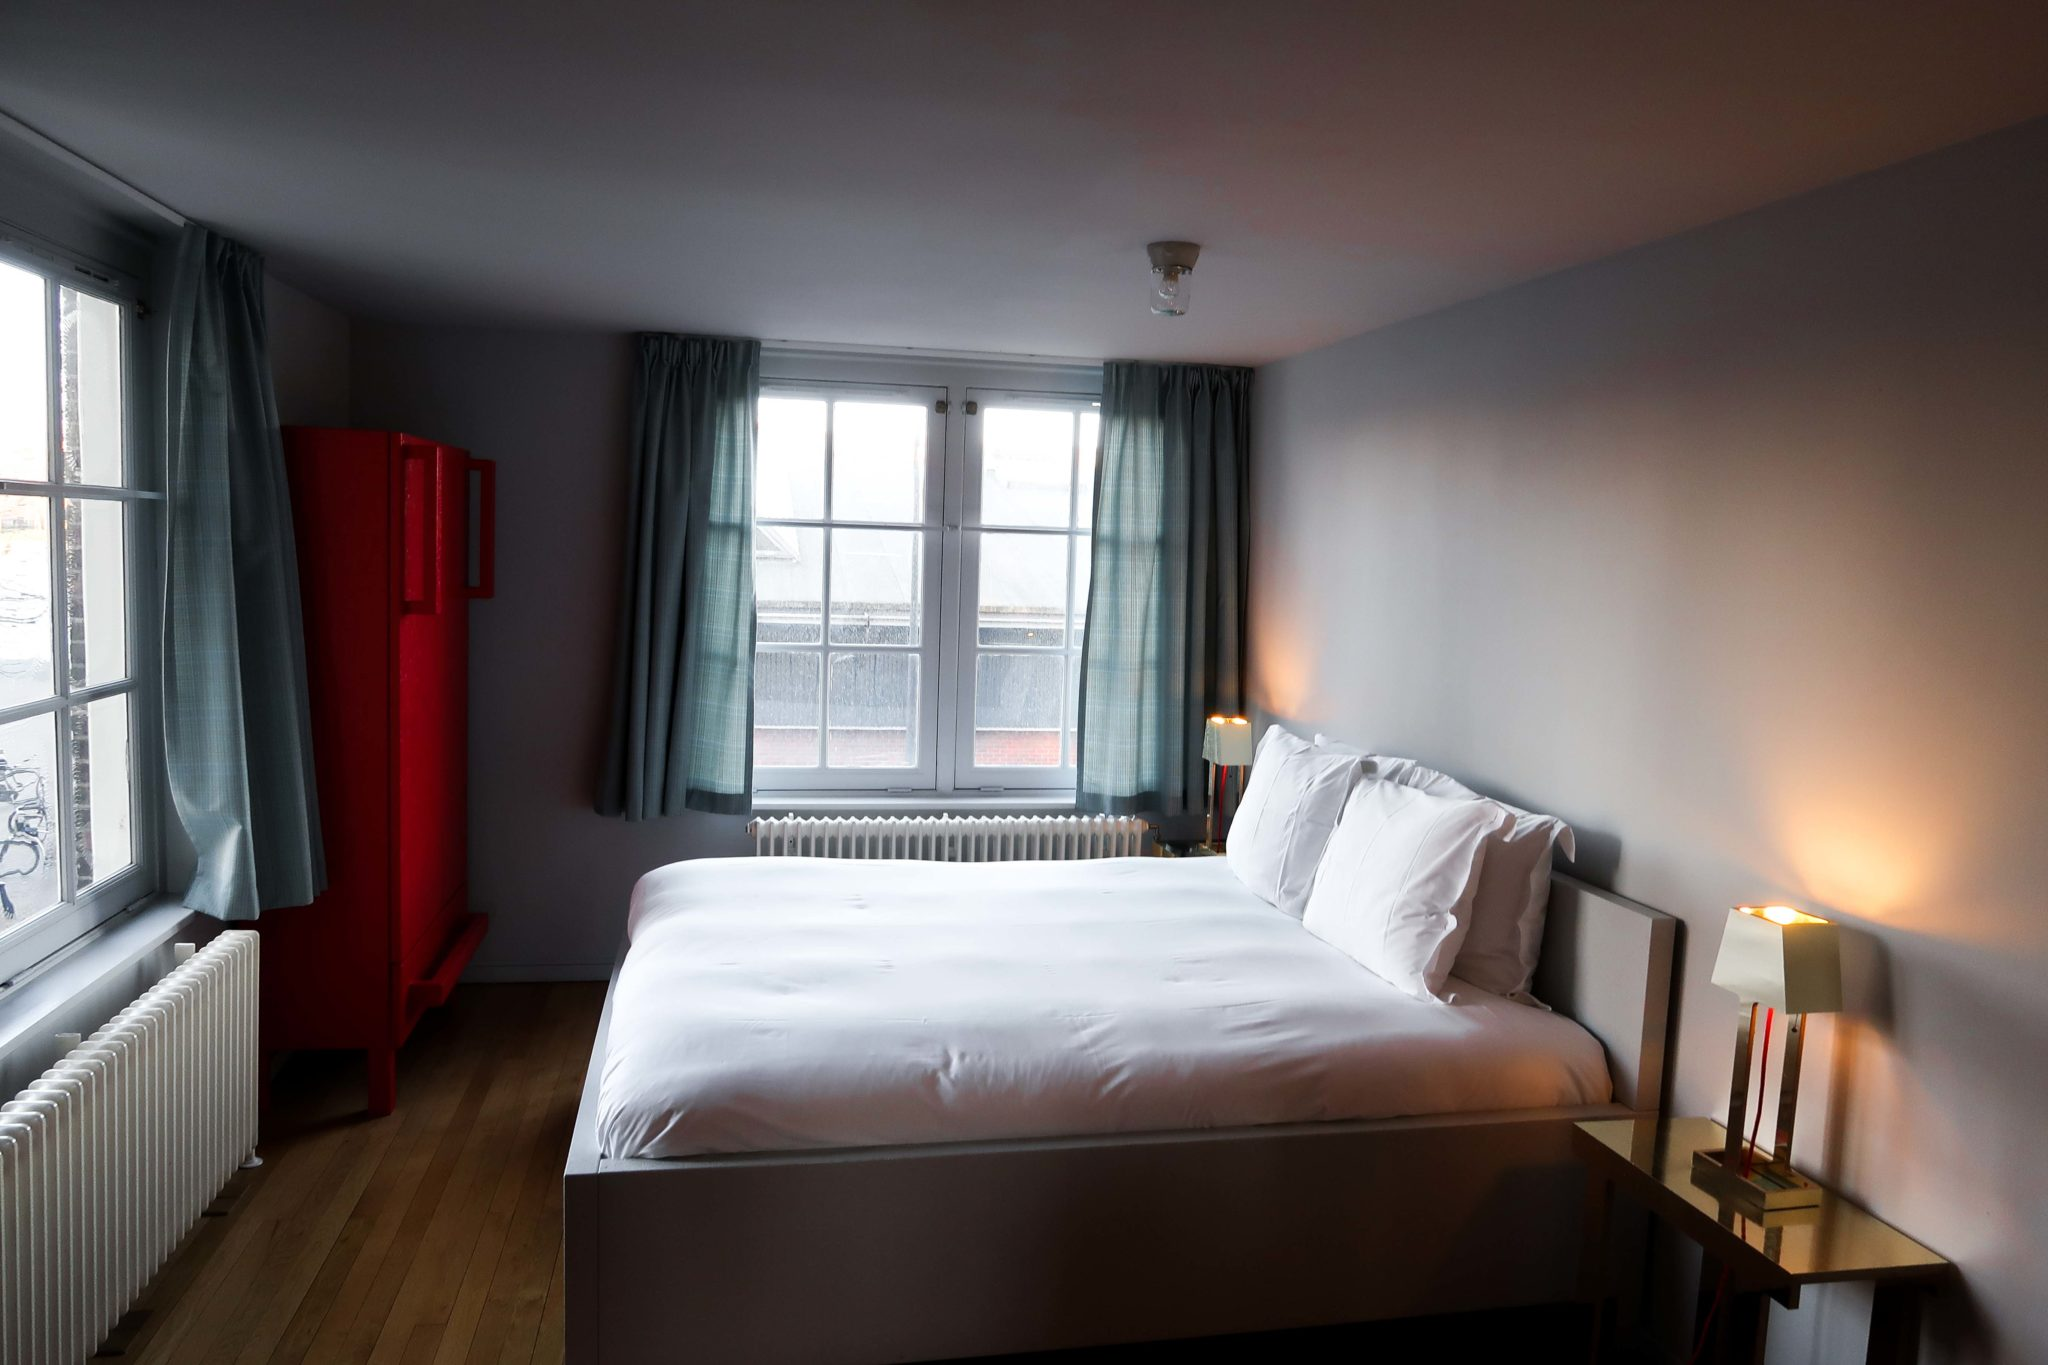 Lloyd hotel amsterdam maurice style travel blog voyage